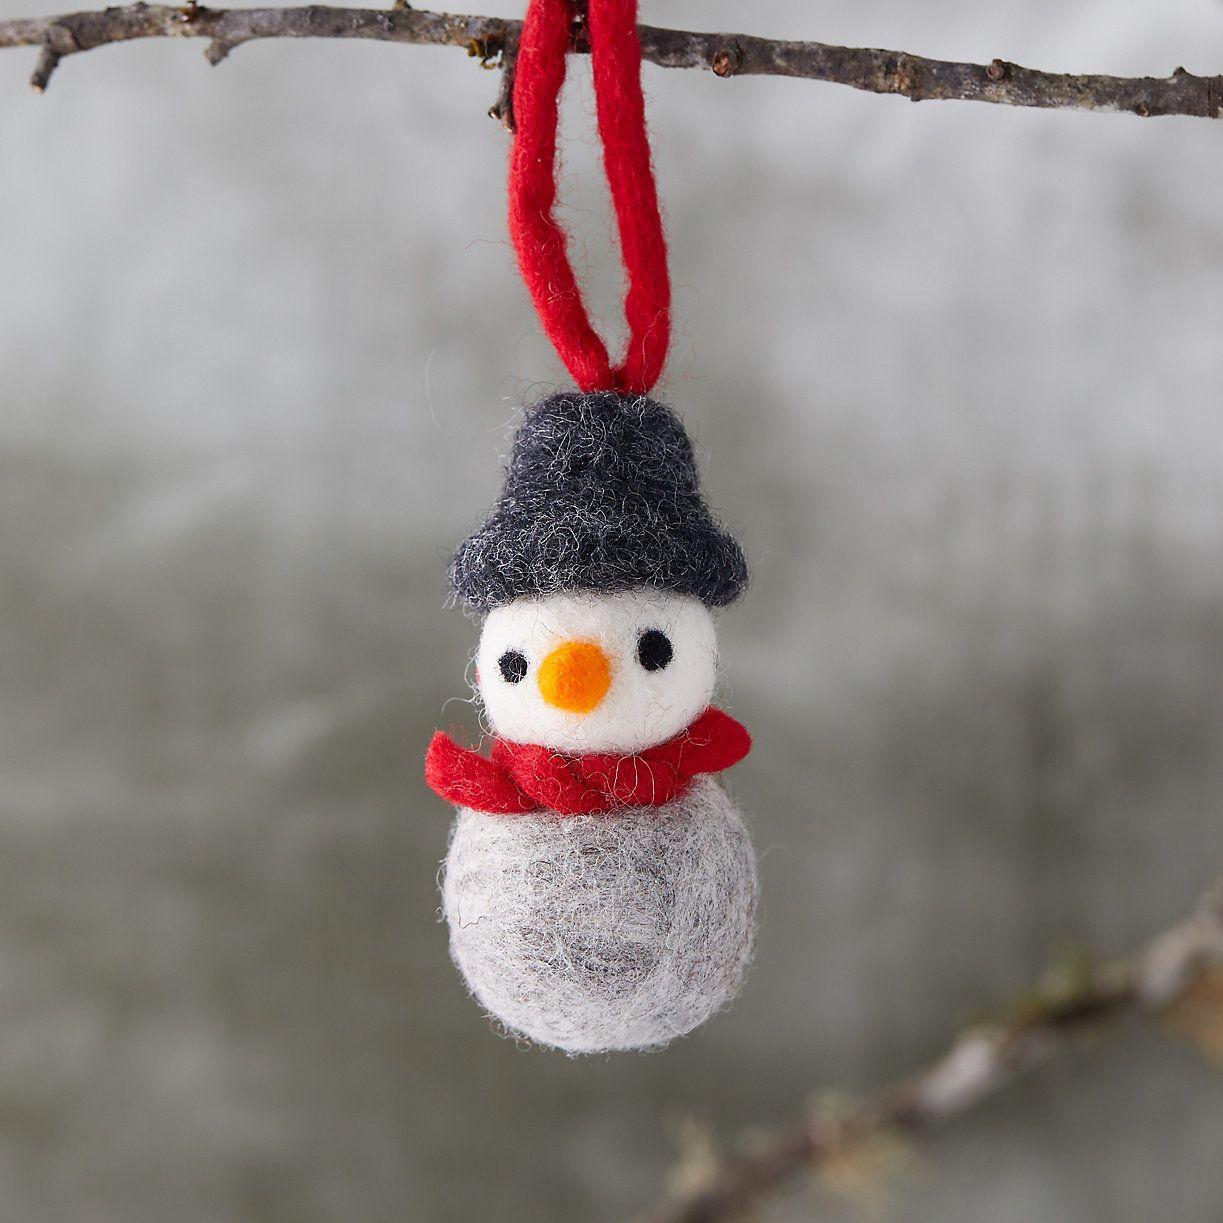 Felted Wool Snowman Ornament In 2020 Snowman Ornaments Wool Felt Felt Ornaments